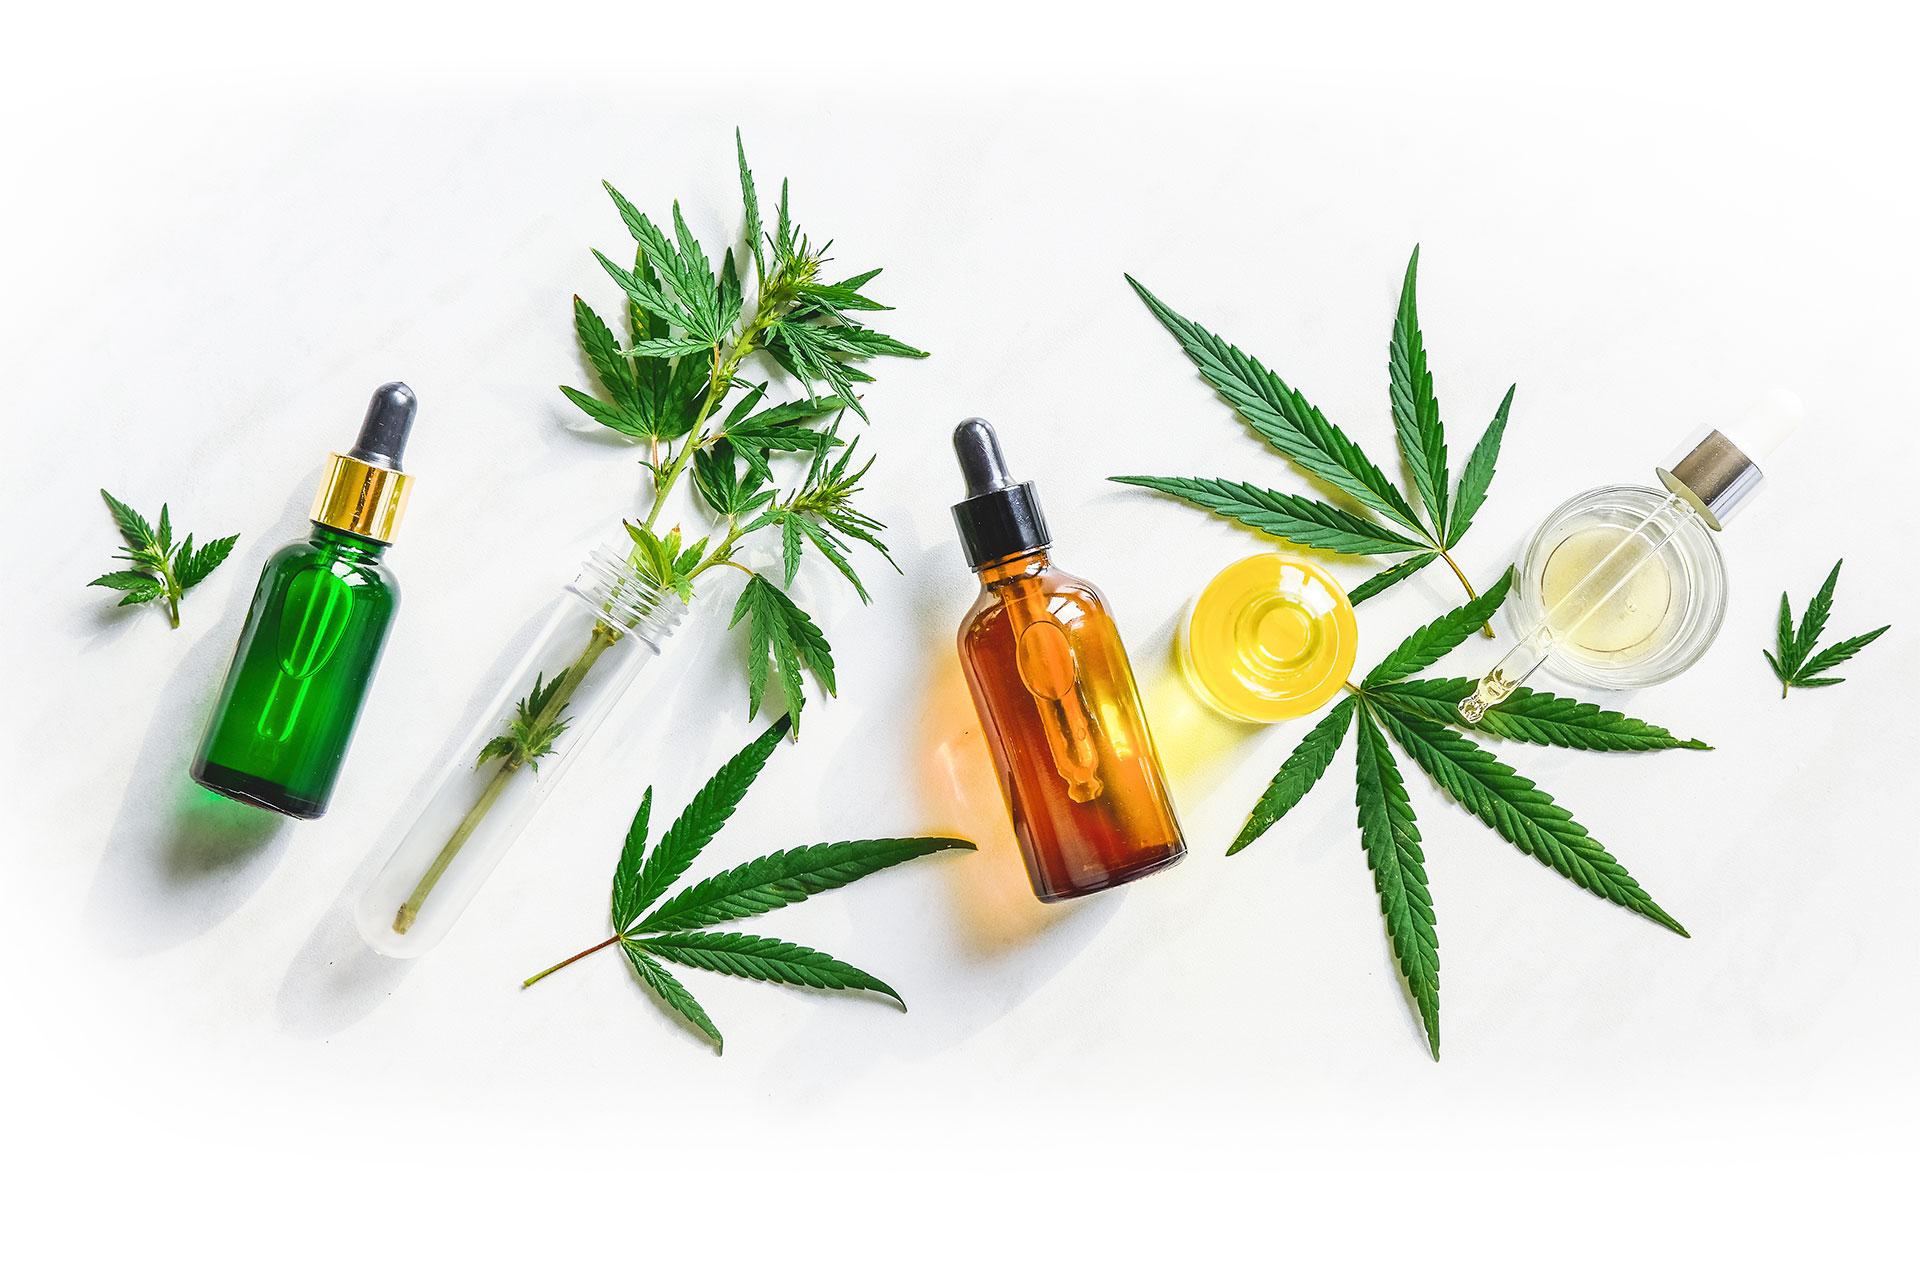 Native American Cannabis Business Model